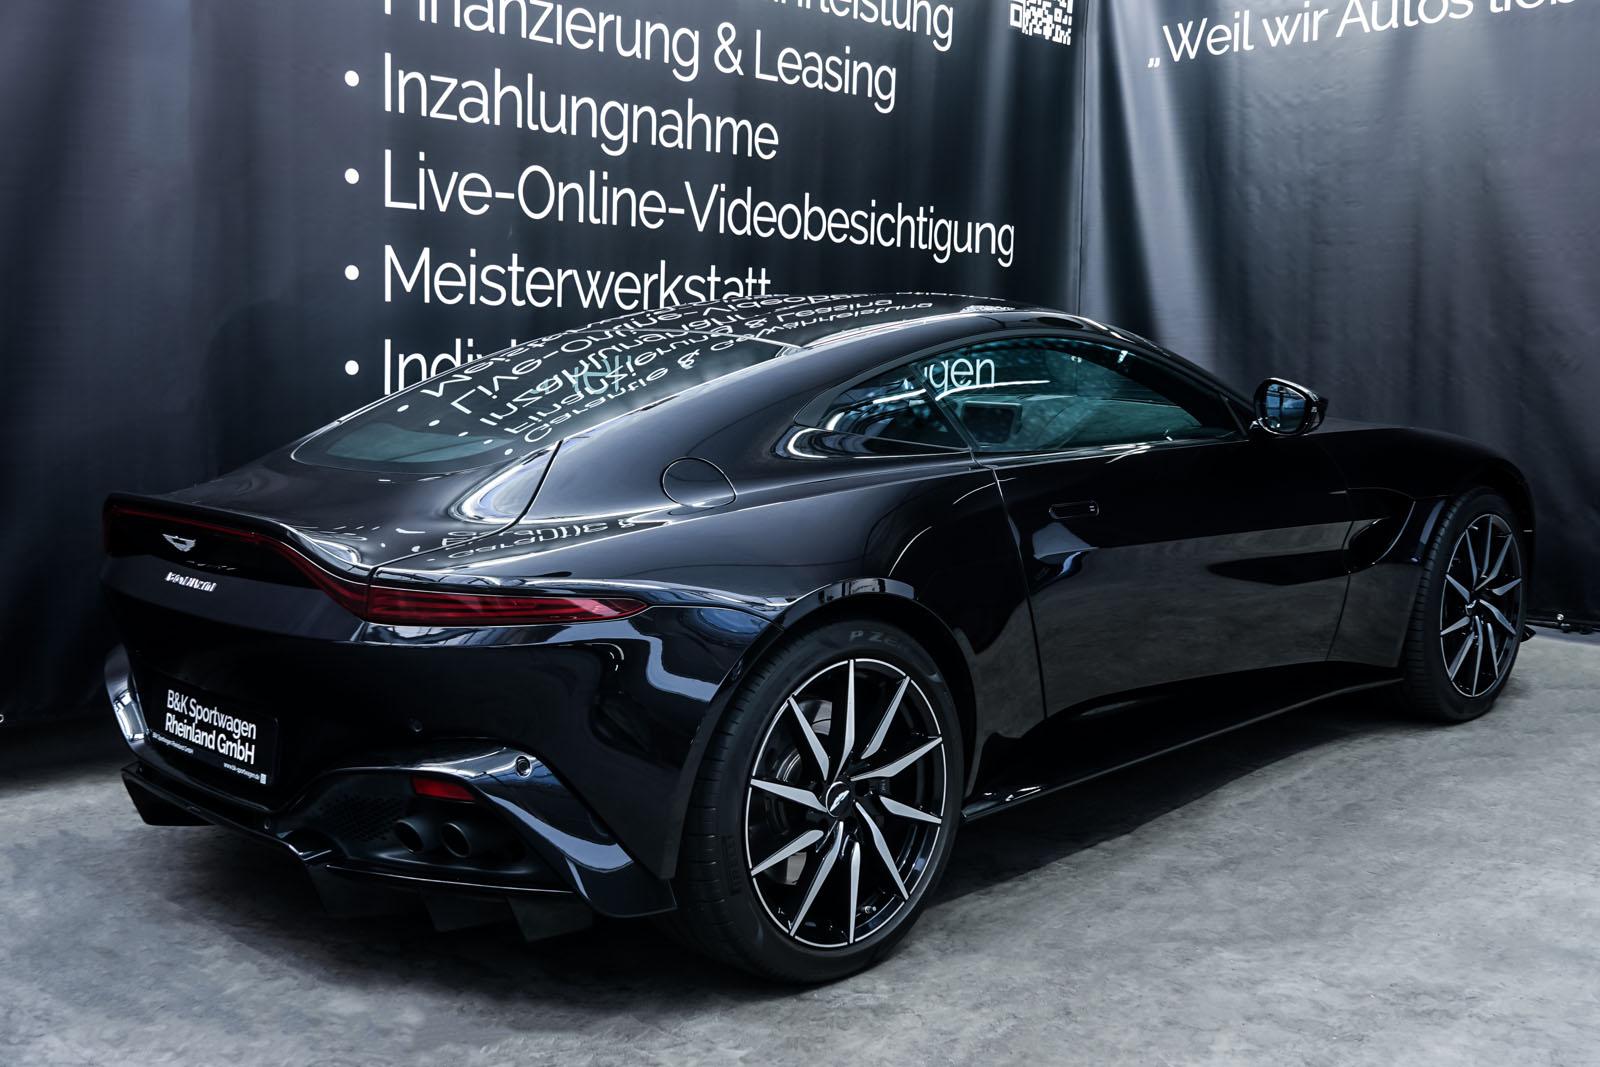 AstonMartin_V8_Vantage_Schwarz_Schwarz_AM-1849_13_w